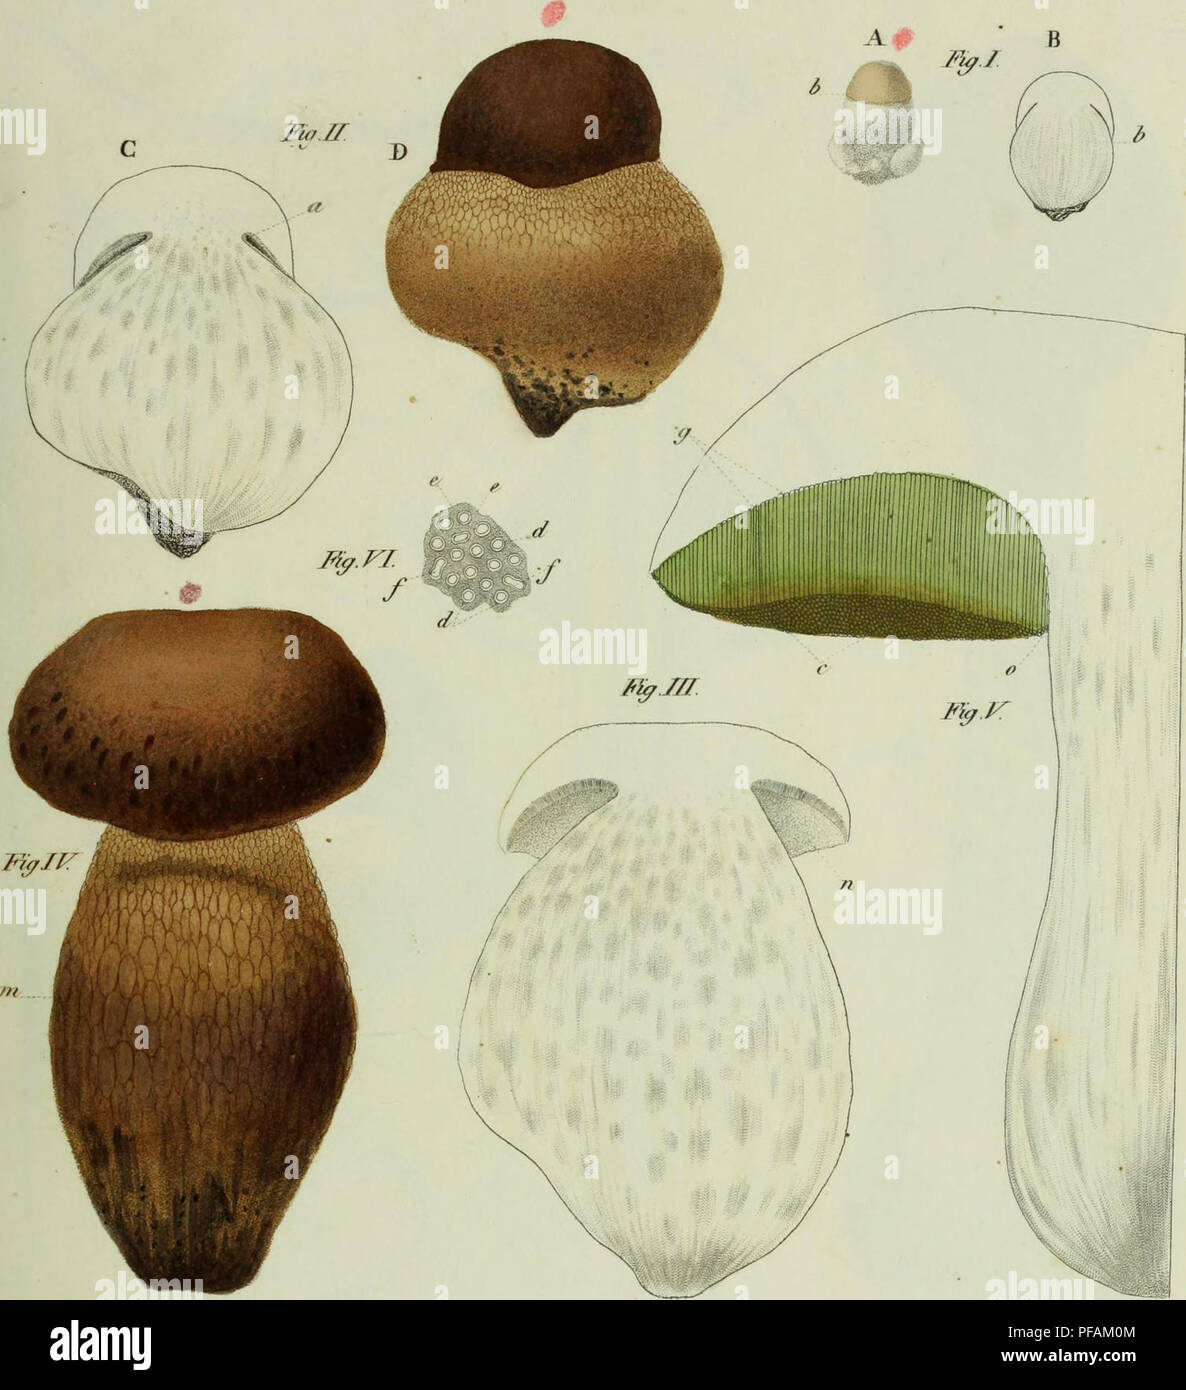 . Descrizione dei funghi mangerecci più comuni dell'Italia e de' velenosi che possono co' medesimi confondersi. Fungi; Mushrooms. - l VX//. / ttf*r<//ni axt nstfltra <. ^/f'/f///j r<â /////.) !. Please note that these images are extracted from scanned page images that may have been digitally enhanced for readability - coloration and appearance of these illustrations may not perfectly resemble the original work.. Vittadini, Carlo; Cavagna Sangiuliani di Gualdana, Antonio, conte, 1843-1913, former owner. IU-R. Milano, Rusconi - Stock Image